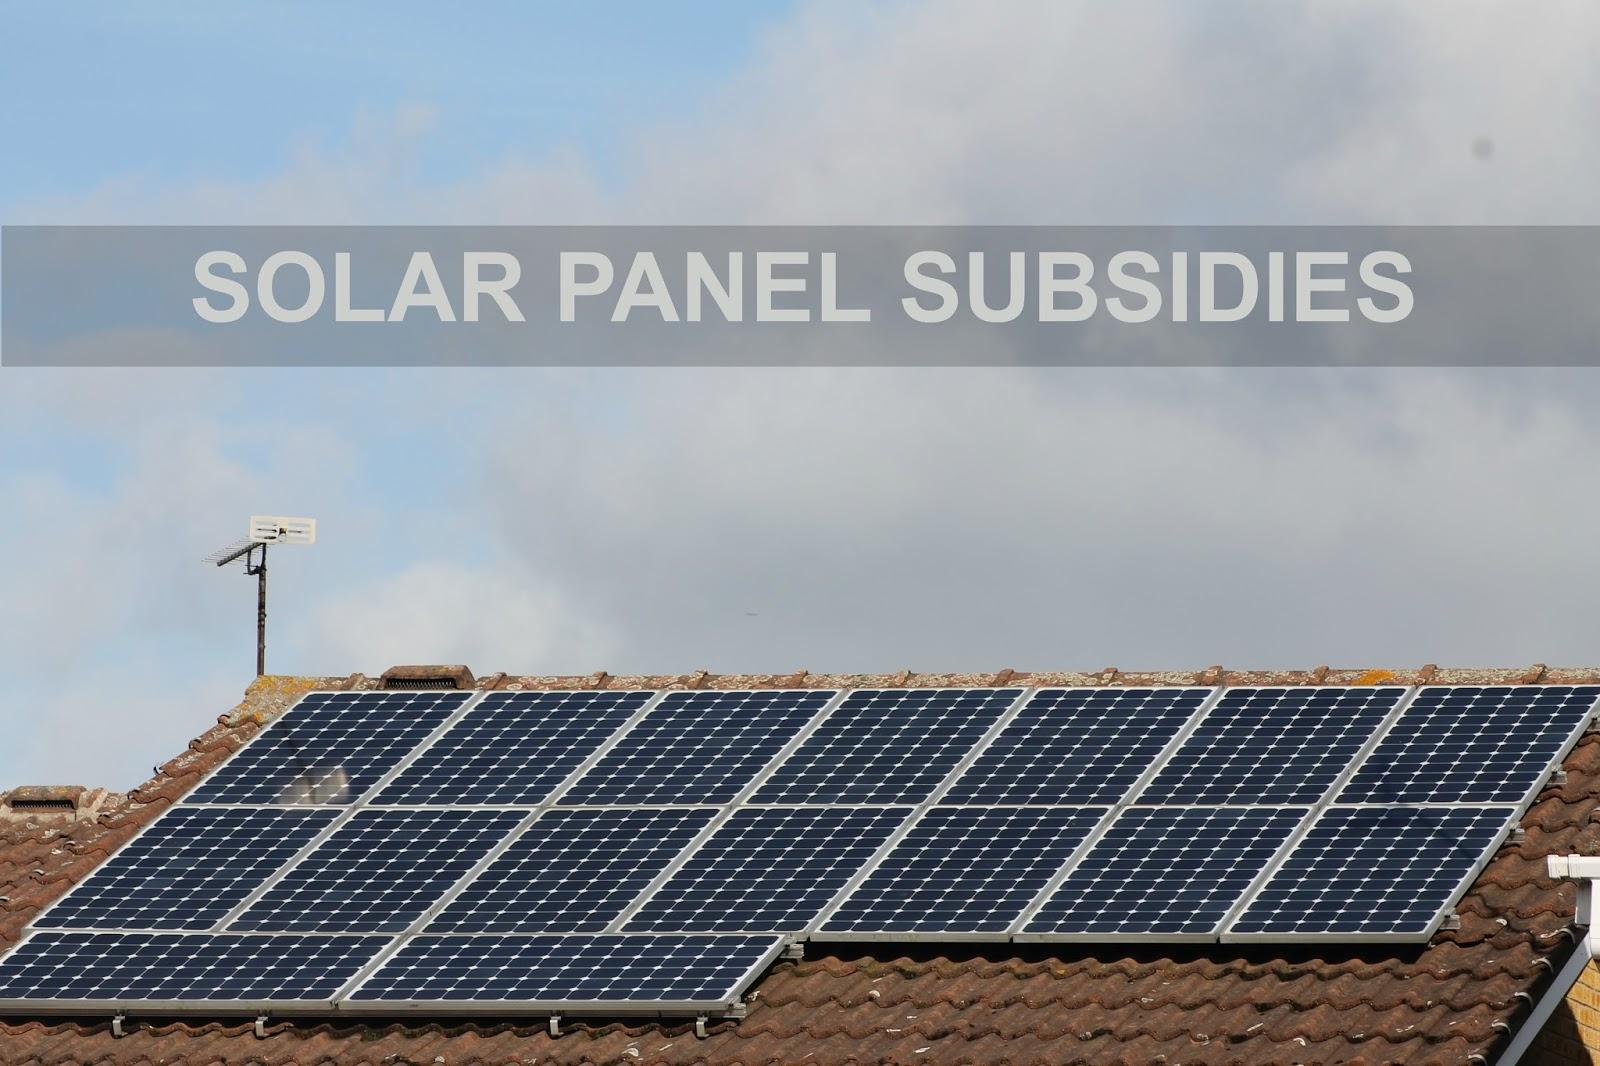 Jibberjabberuk Finance Fridays Solar Panel Subsidies